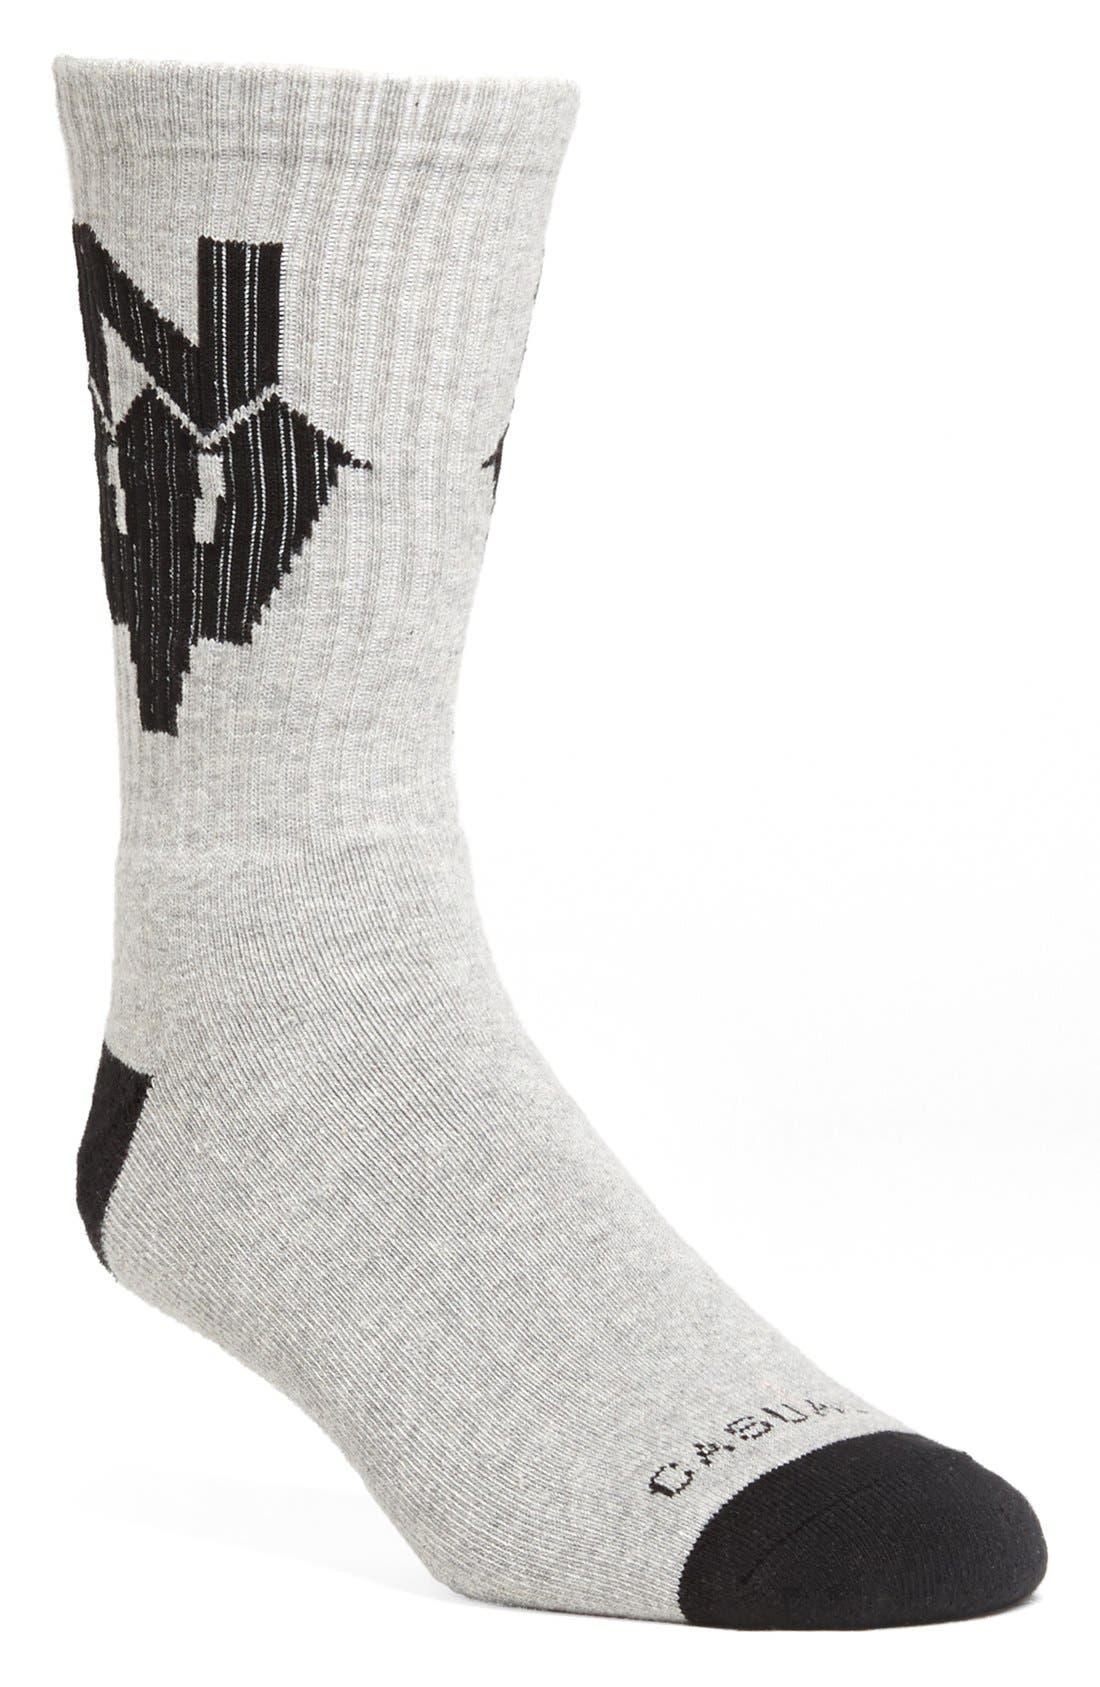 Main Image - Casual Industrees 'N Dub' Socks